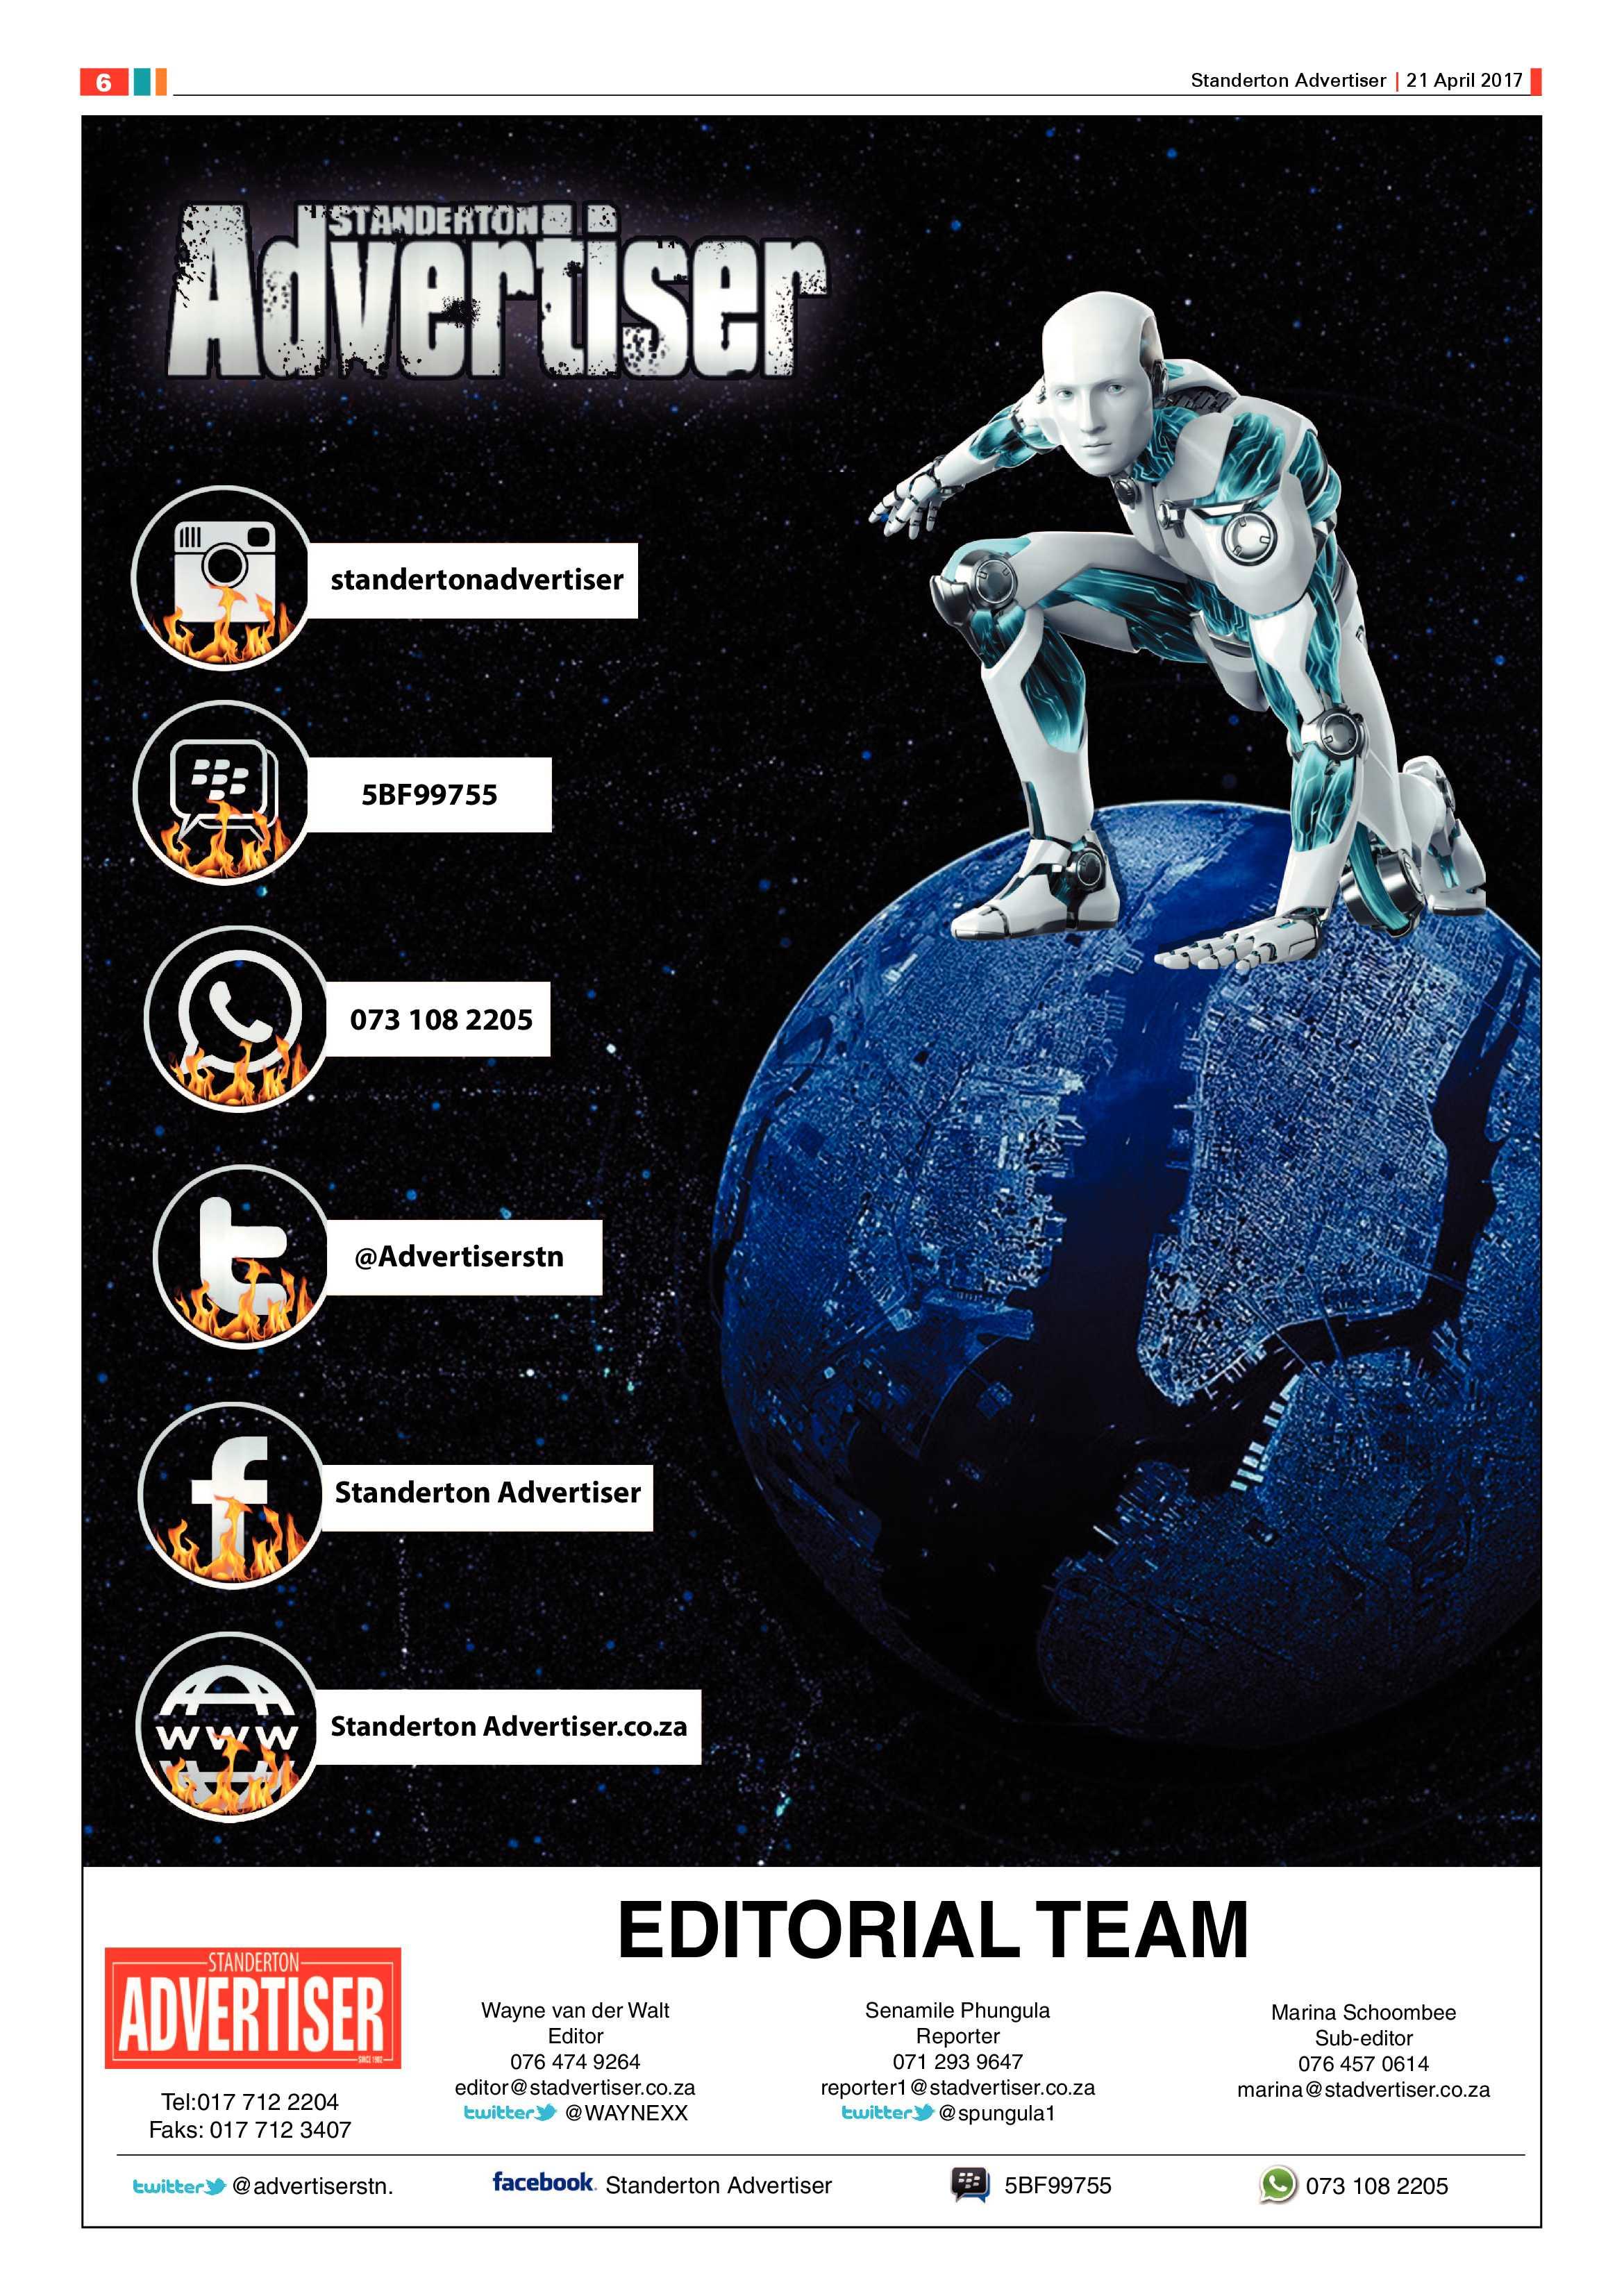 standerton-advertiser-21-april-2017-epapers-page-6